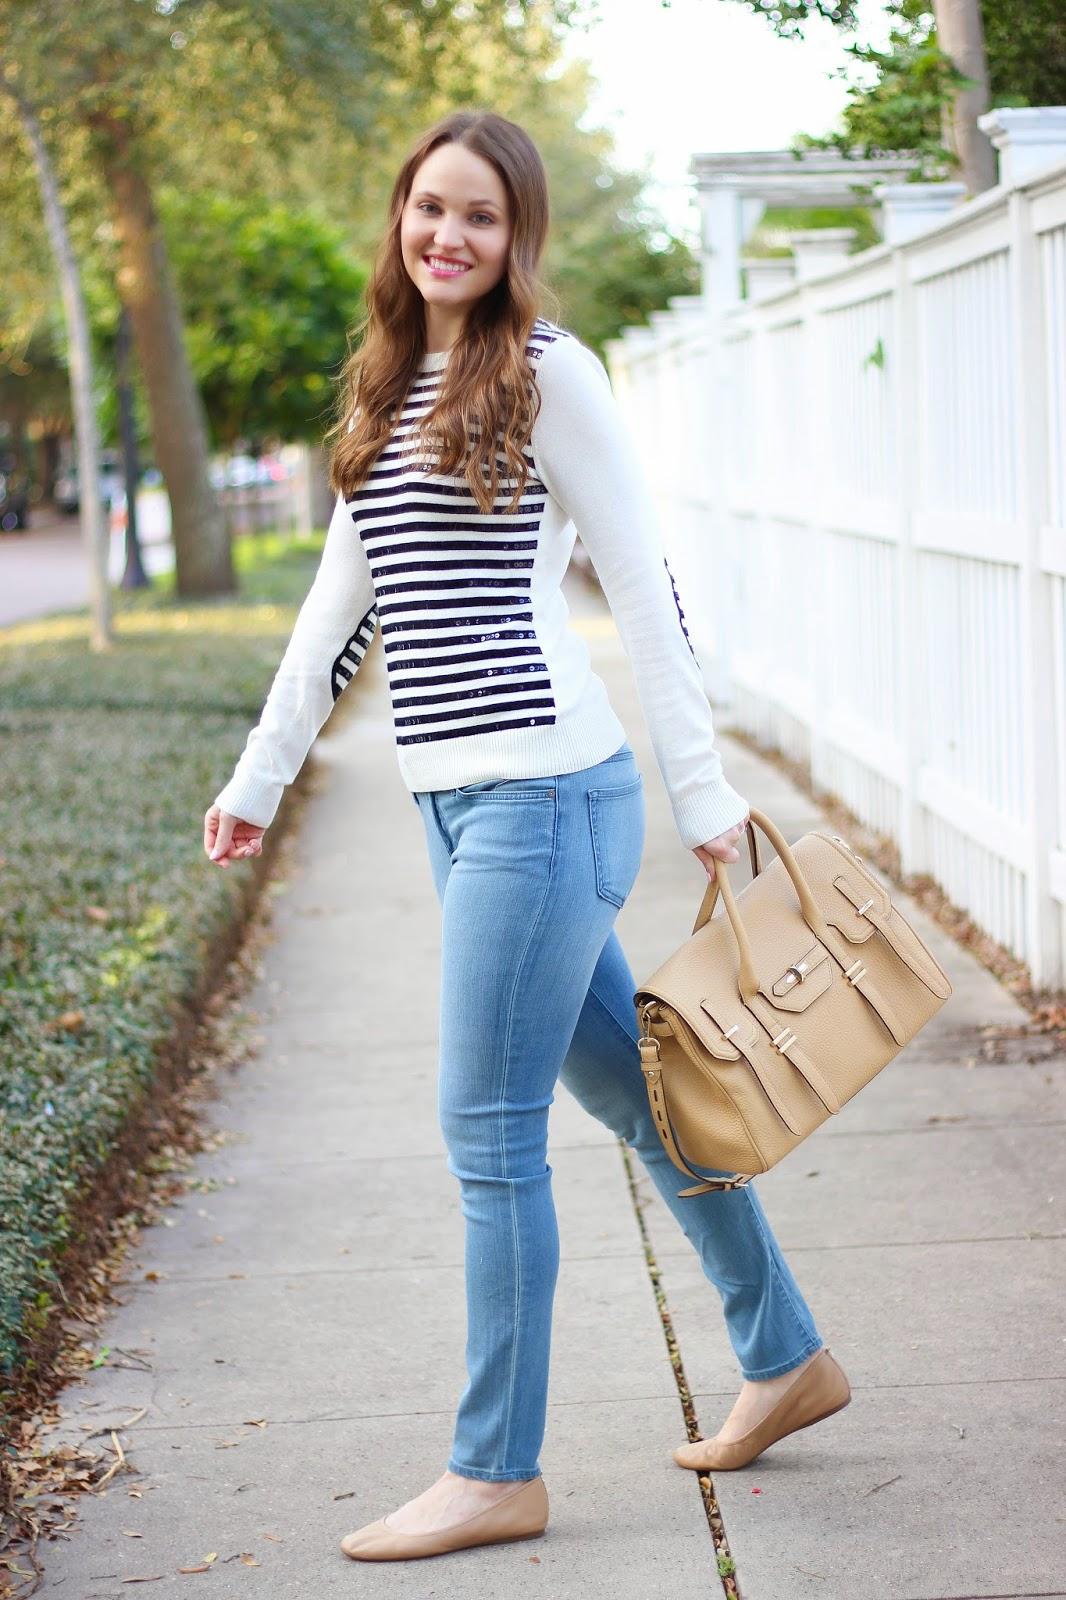 Black Woman In White Tshirt Slender Legs Stock Photo